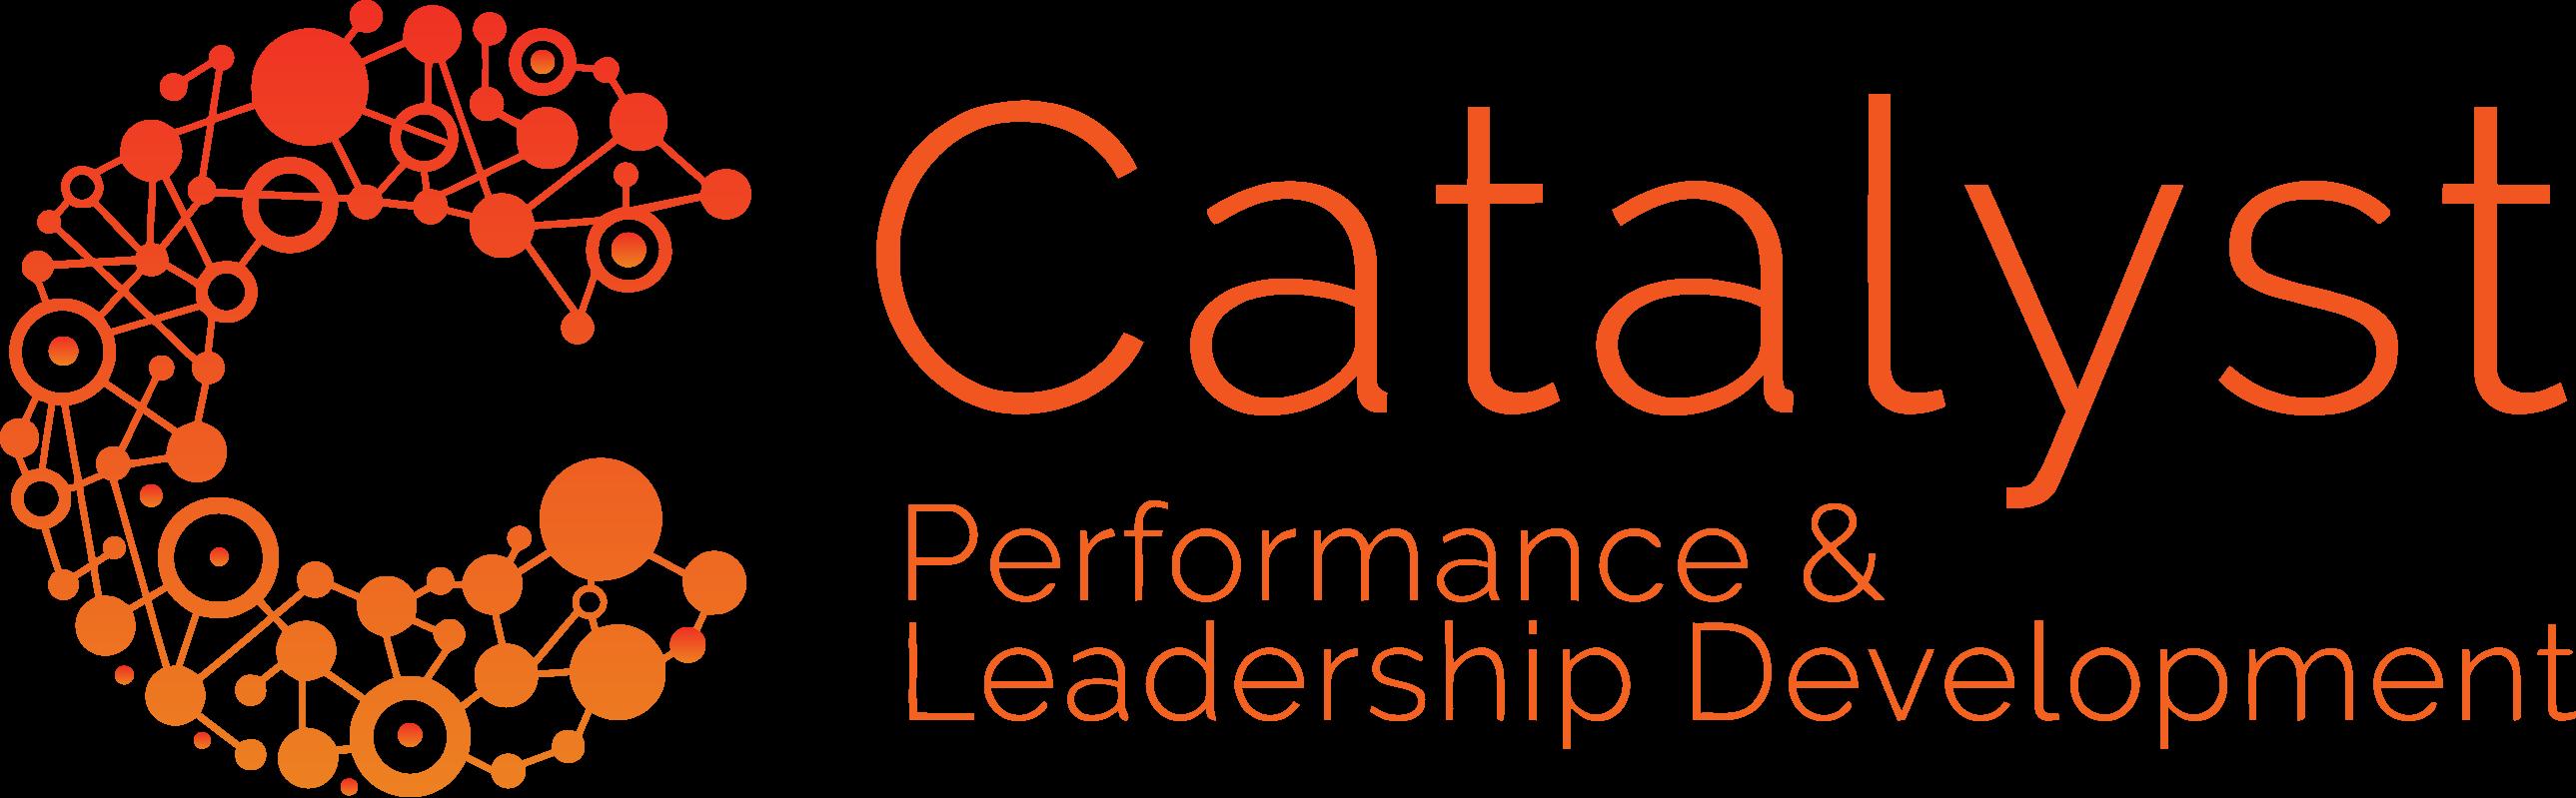 Catalyst Performance and Leadership Development Ltd. Cover